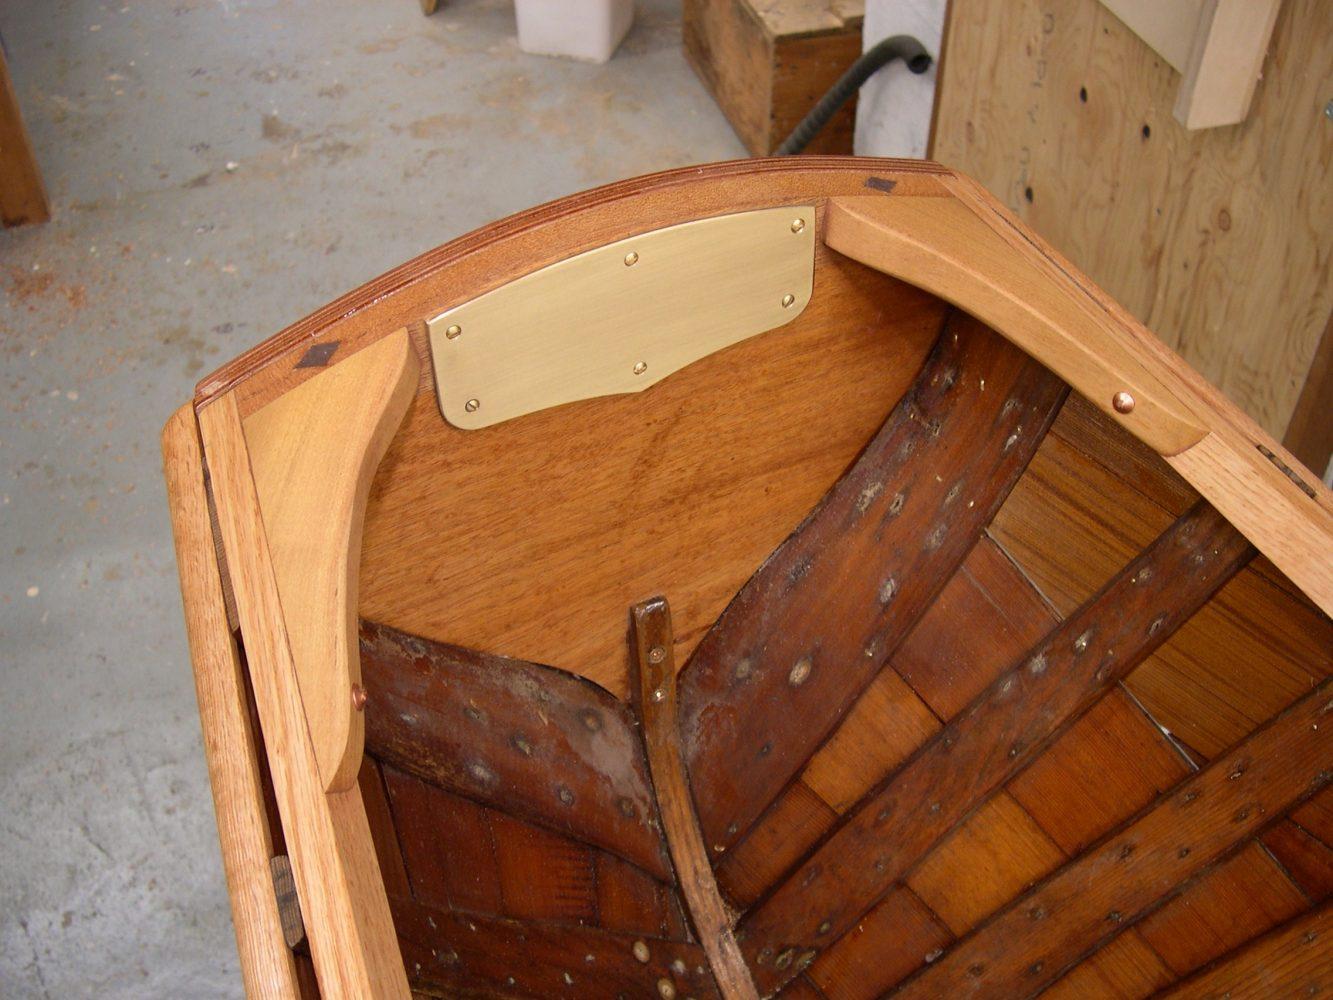 Thompson canoe transom